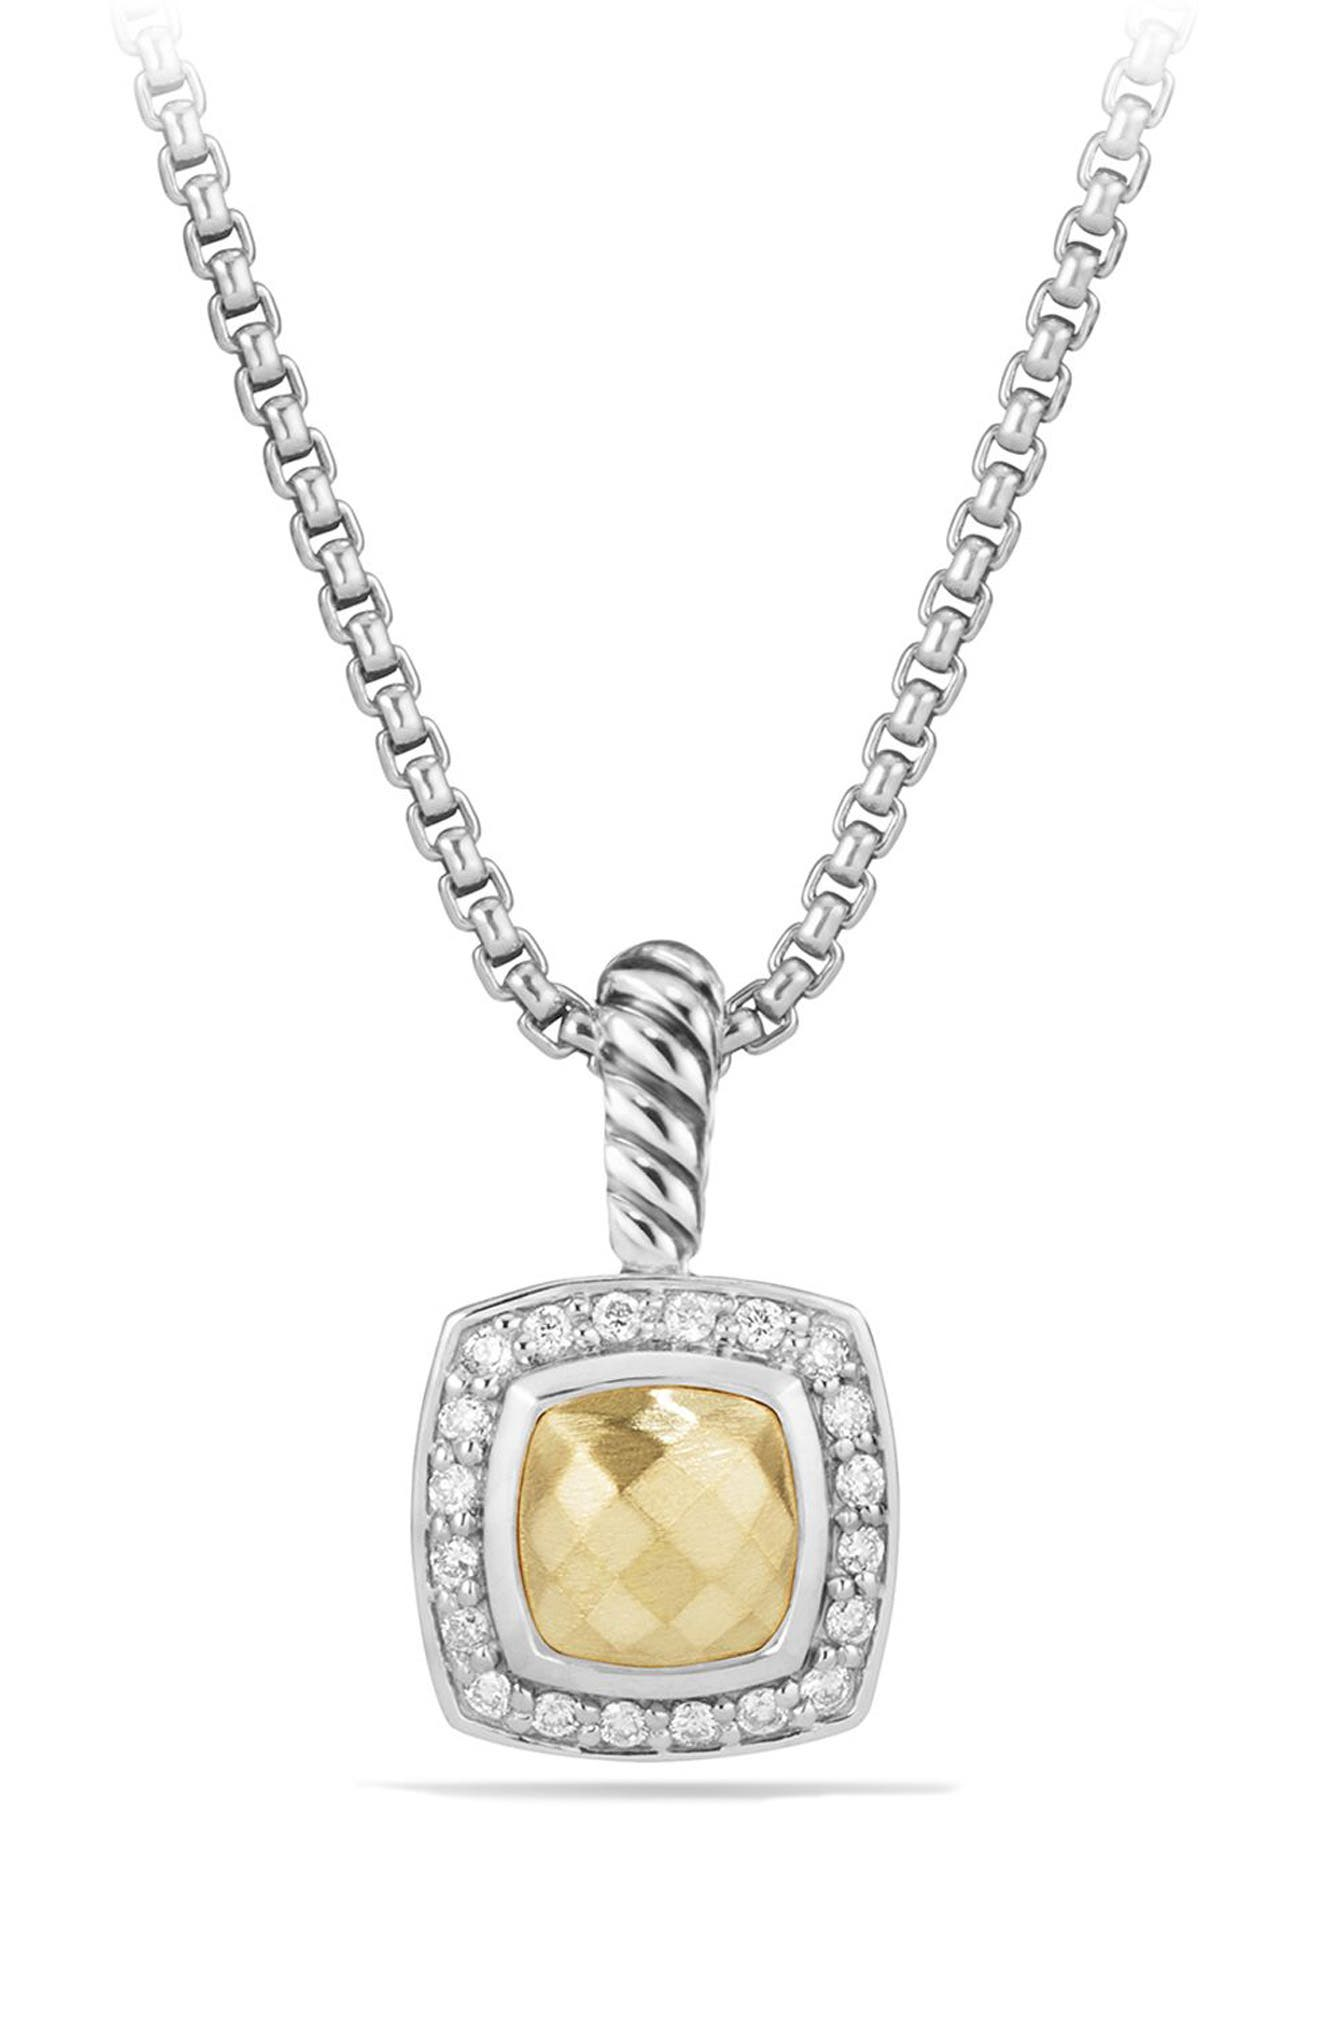 Petite Albion<sup>®</sup> Pendant Necklace with Diamonds,                             Main thumbnail 1, color,                             SILVER/ GOLD